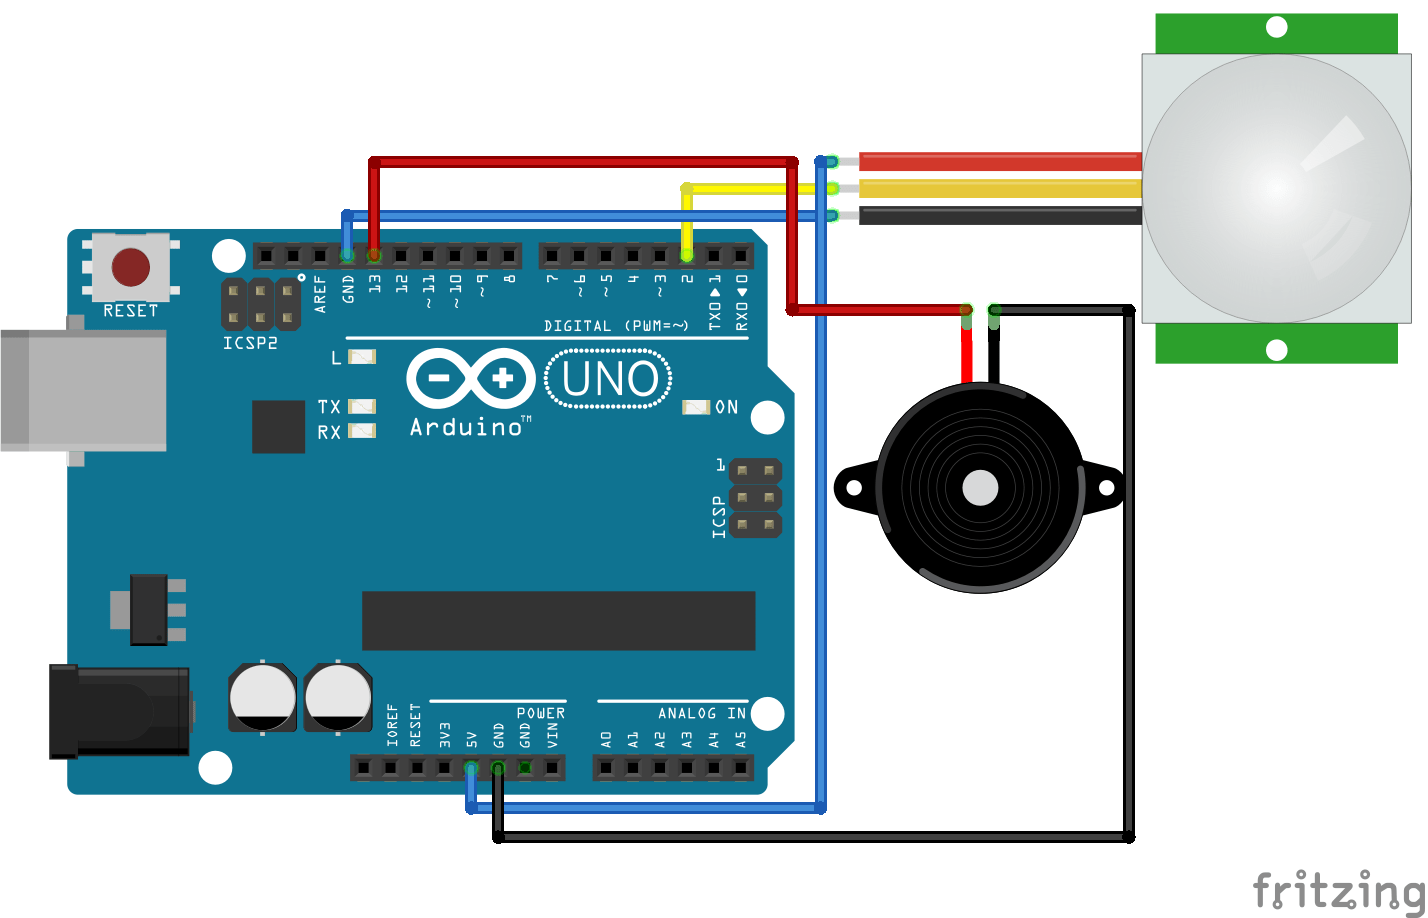 burglar alarm pir sensor wiring diagram lutron 3 way dimmer home automation arduino web server for smart control